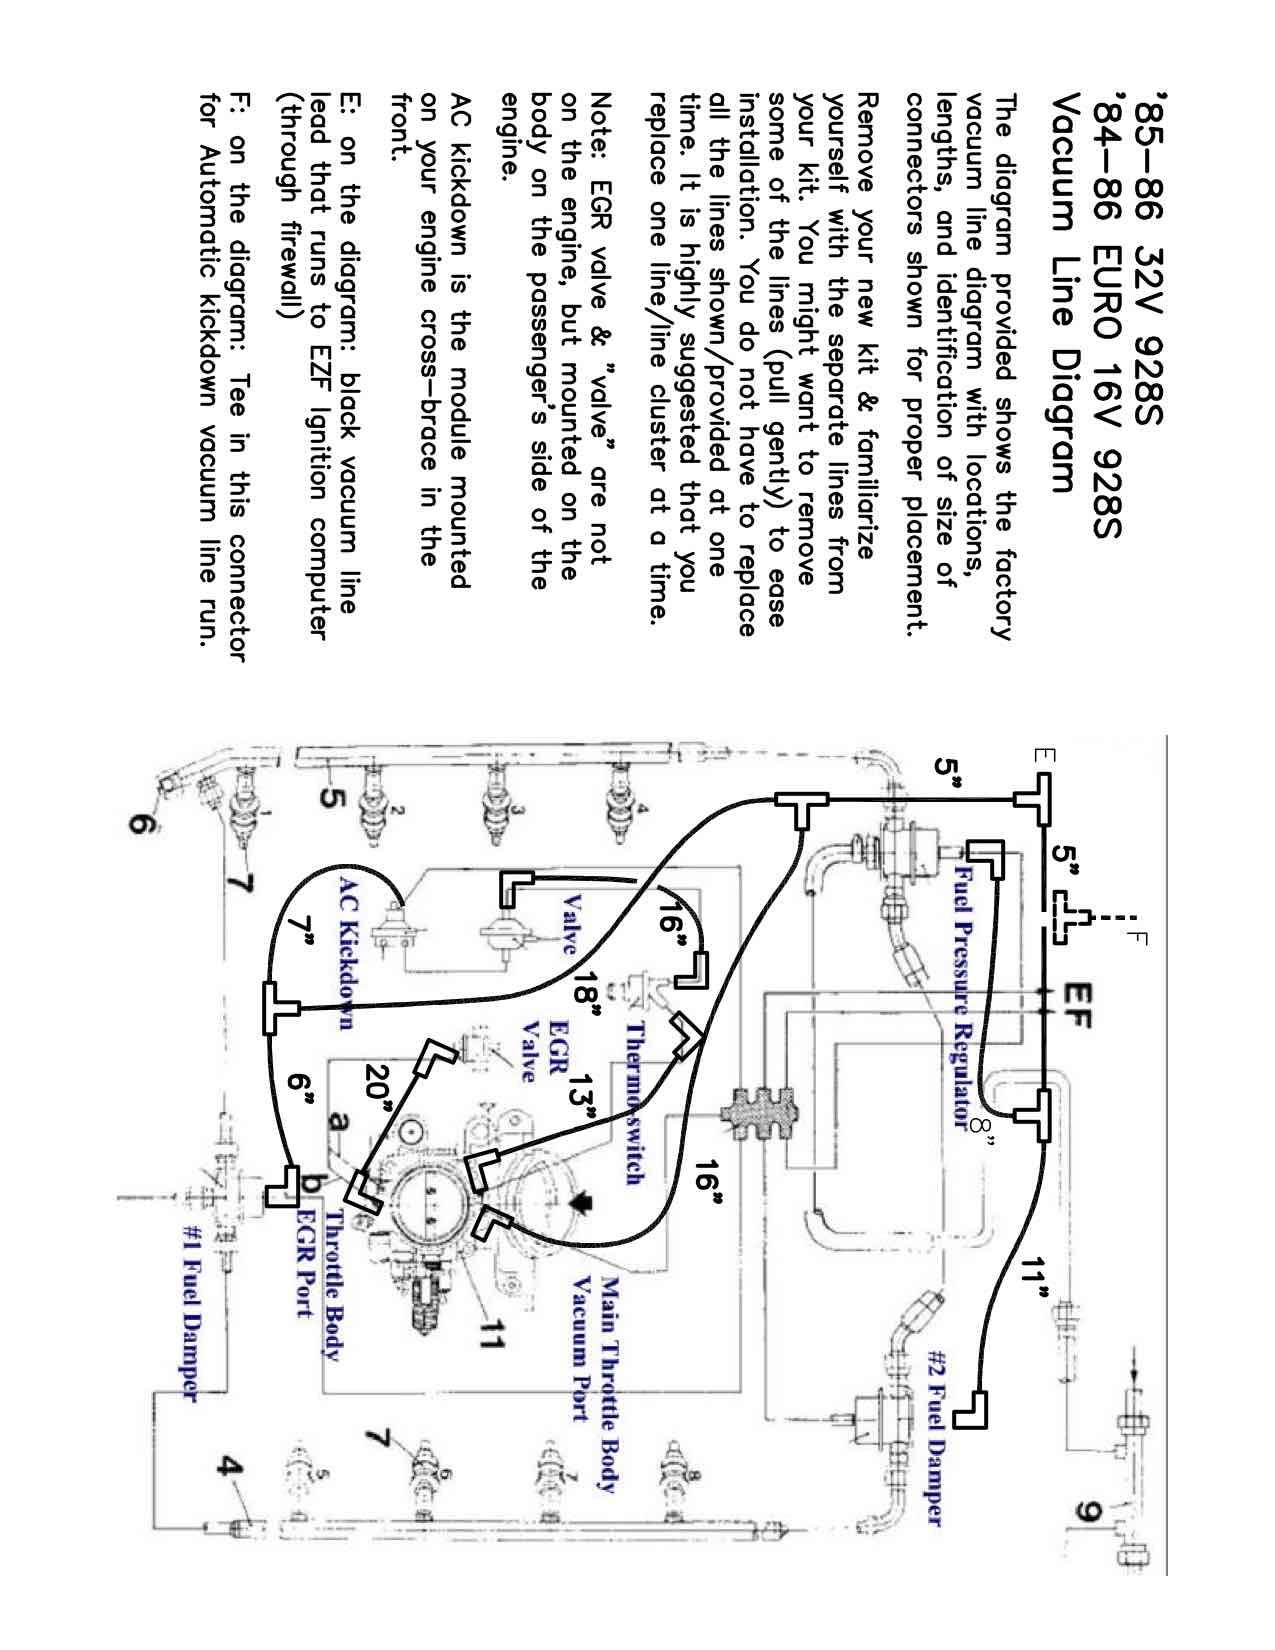 1987 porsche 924s wiring diagram car audio auto